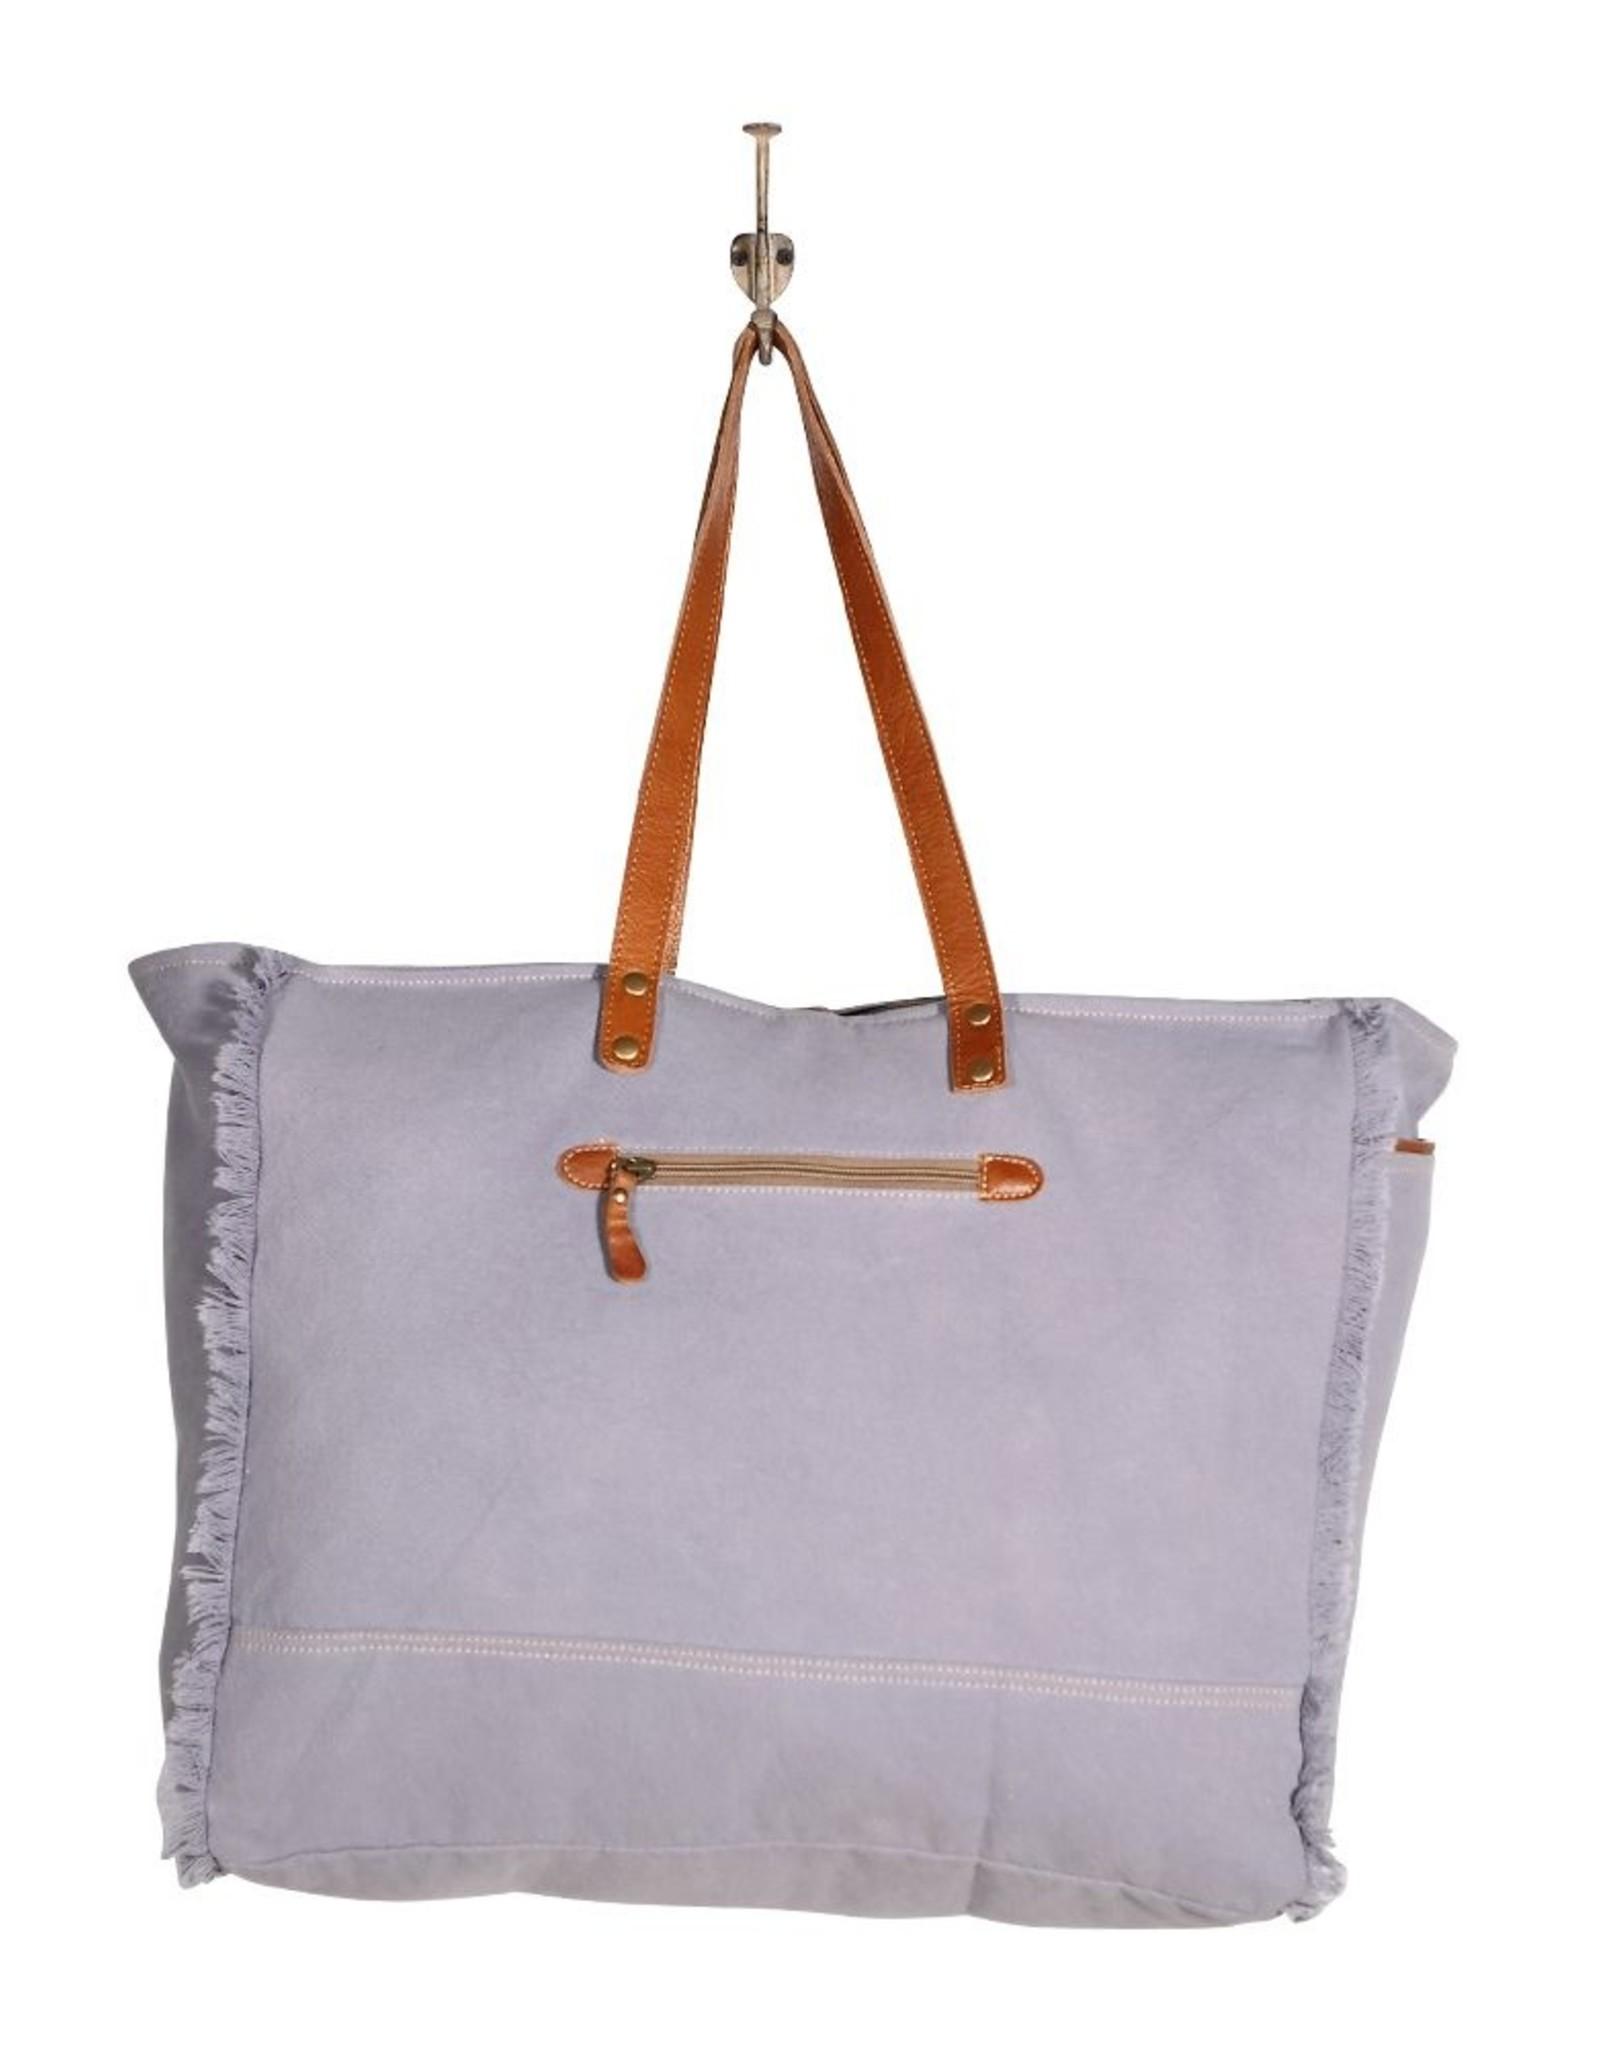 Myra Bag Spacious Aztec Weekender Tote Bag